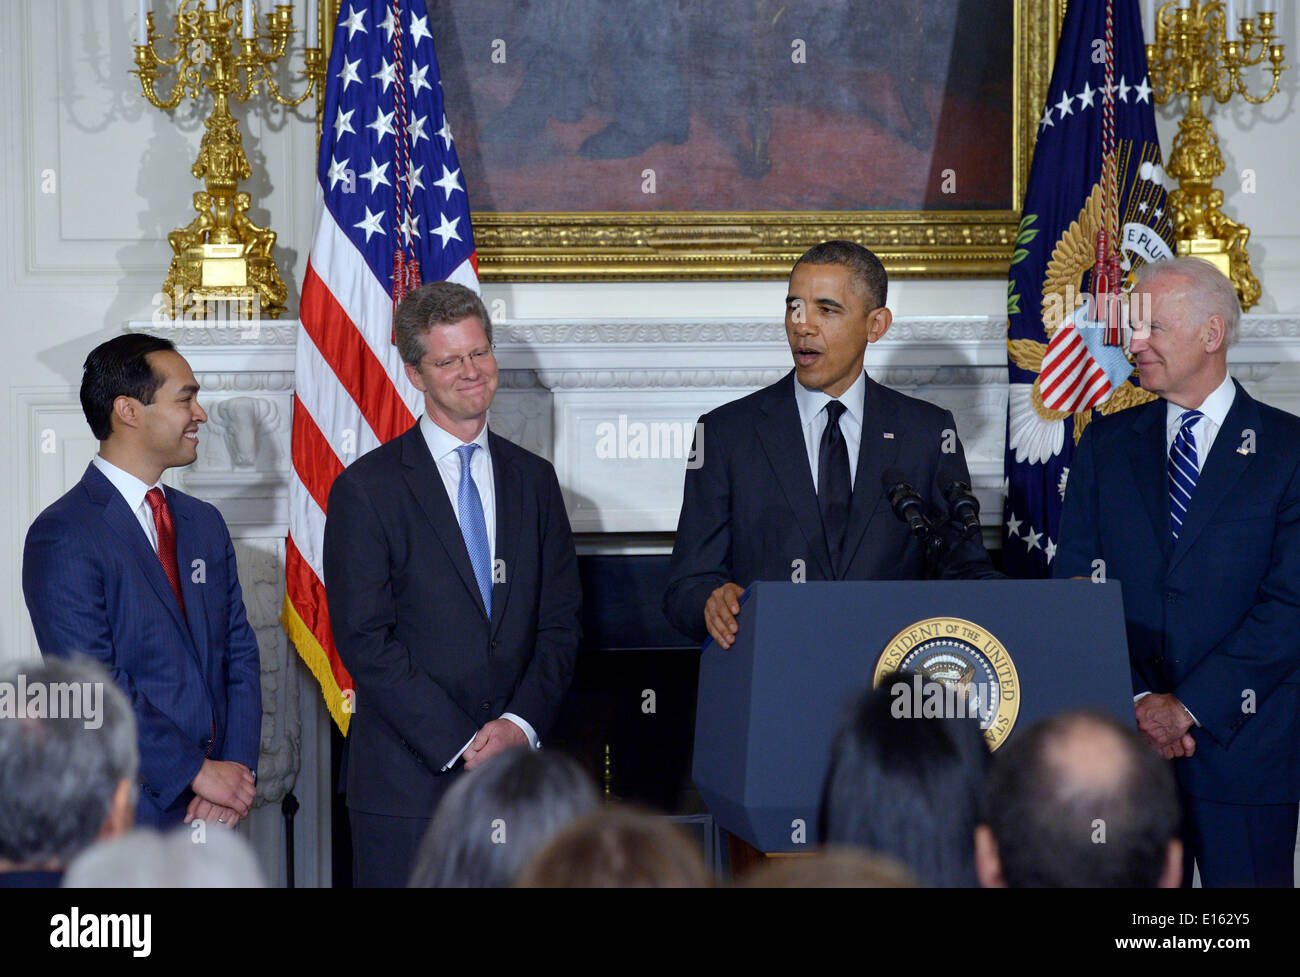 Washington, DC, USA. 23rd May, 2014. U.S. President Barack Obama (2nd R) and Vice President Joe Biden (1st R) attend Stock Photo